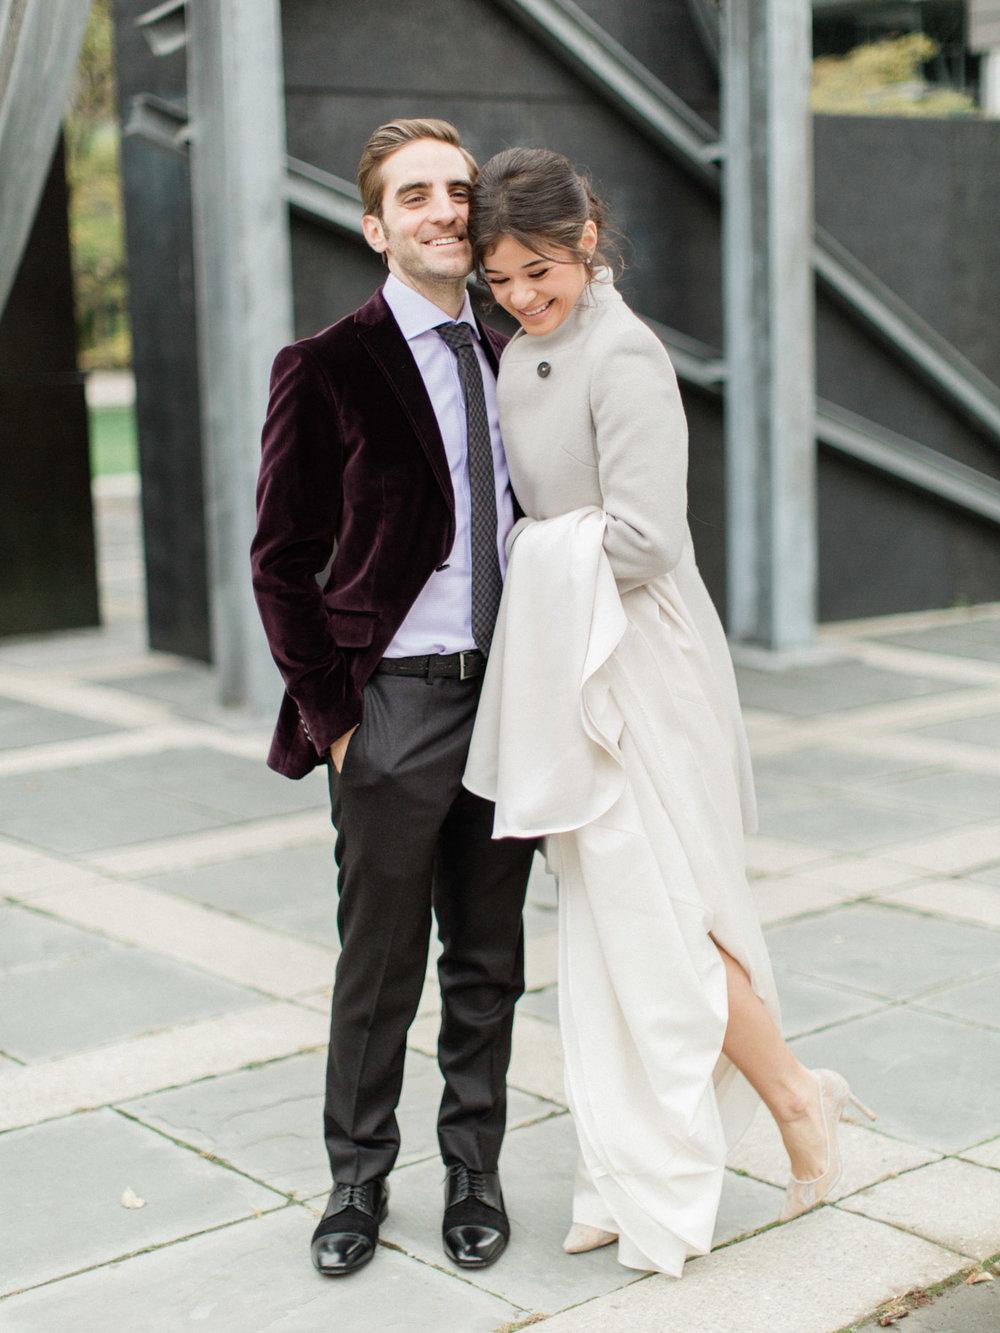 corynn-fowler-photography-toronto-collingwood-destination-wedding-photographer-230.jpg